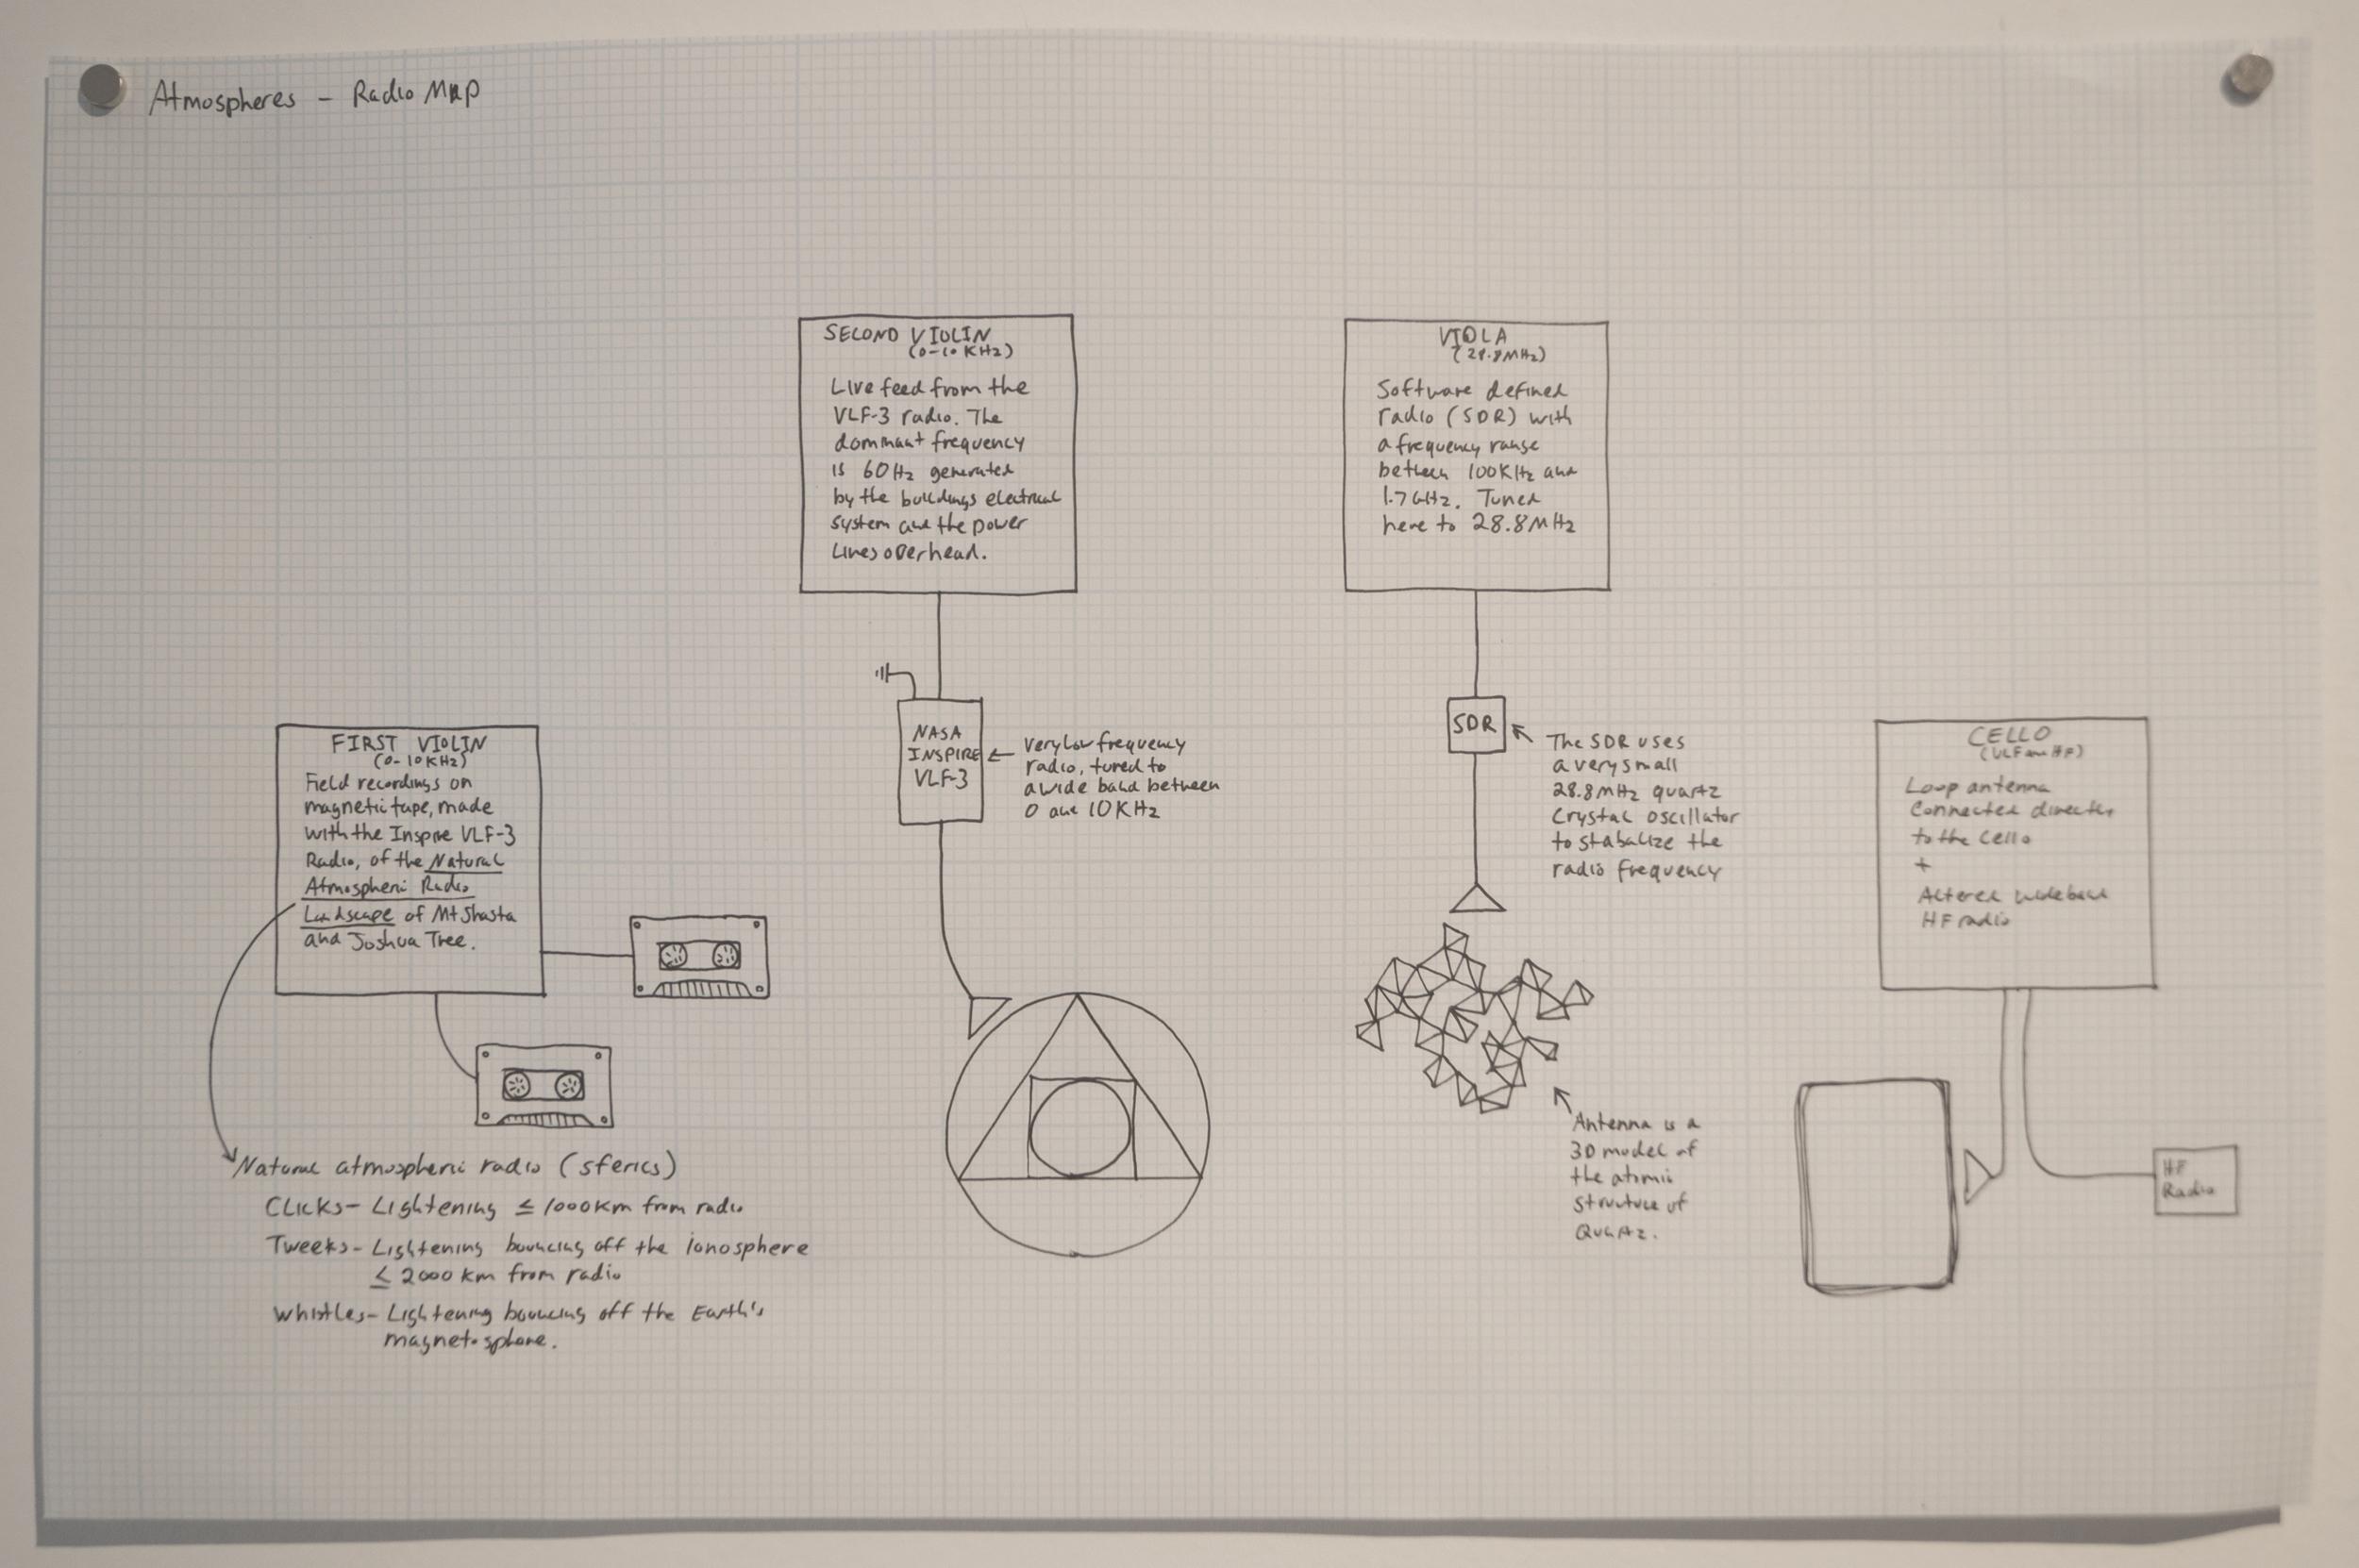 map of string quartet, radios and antennas